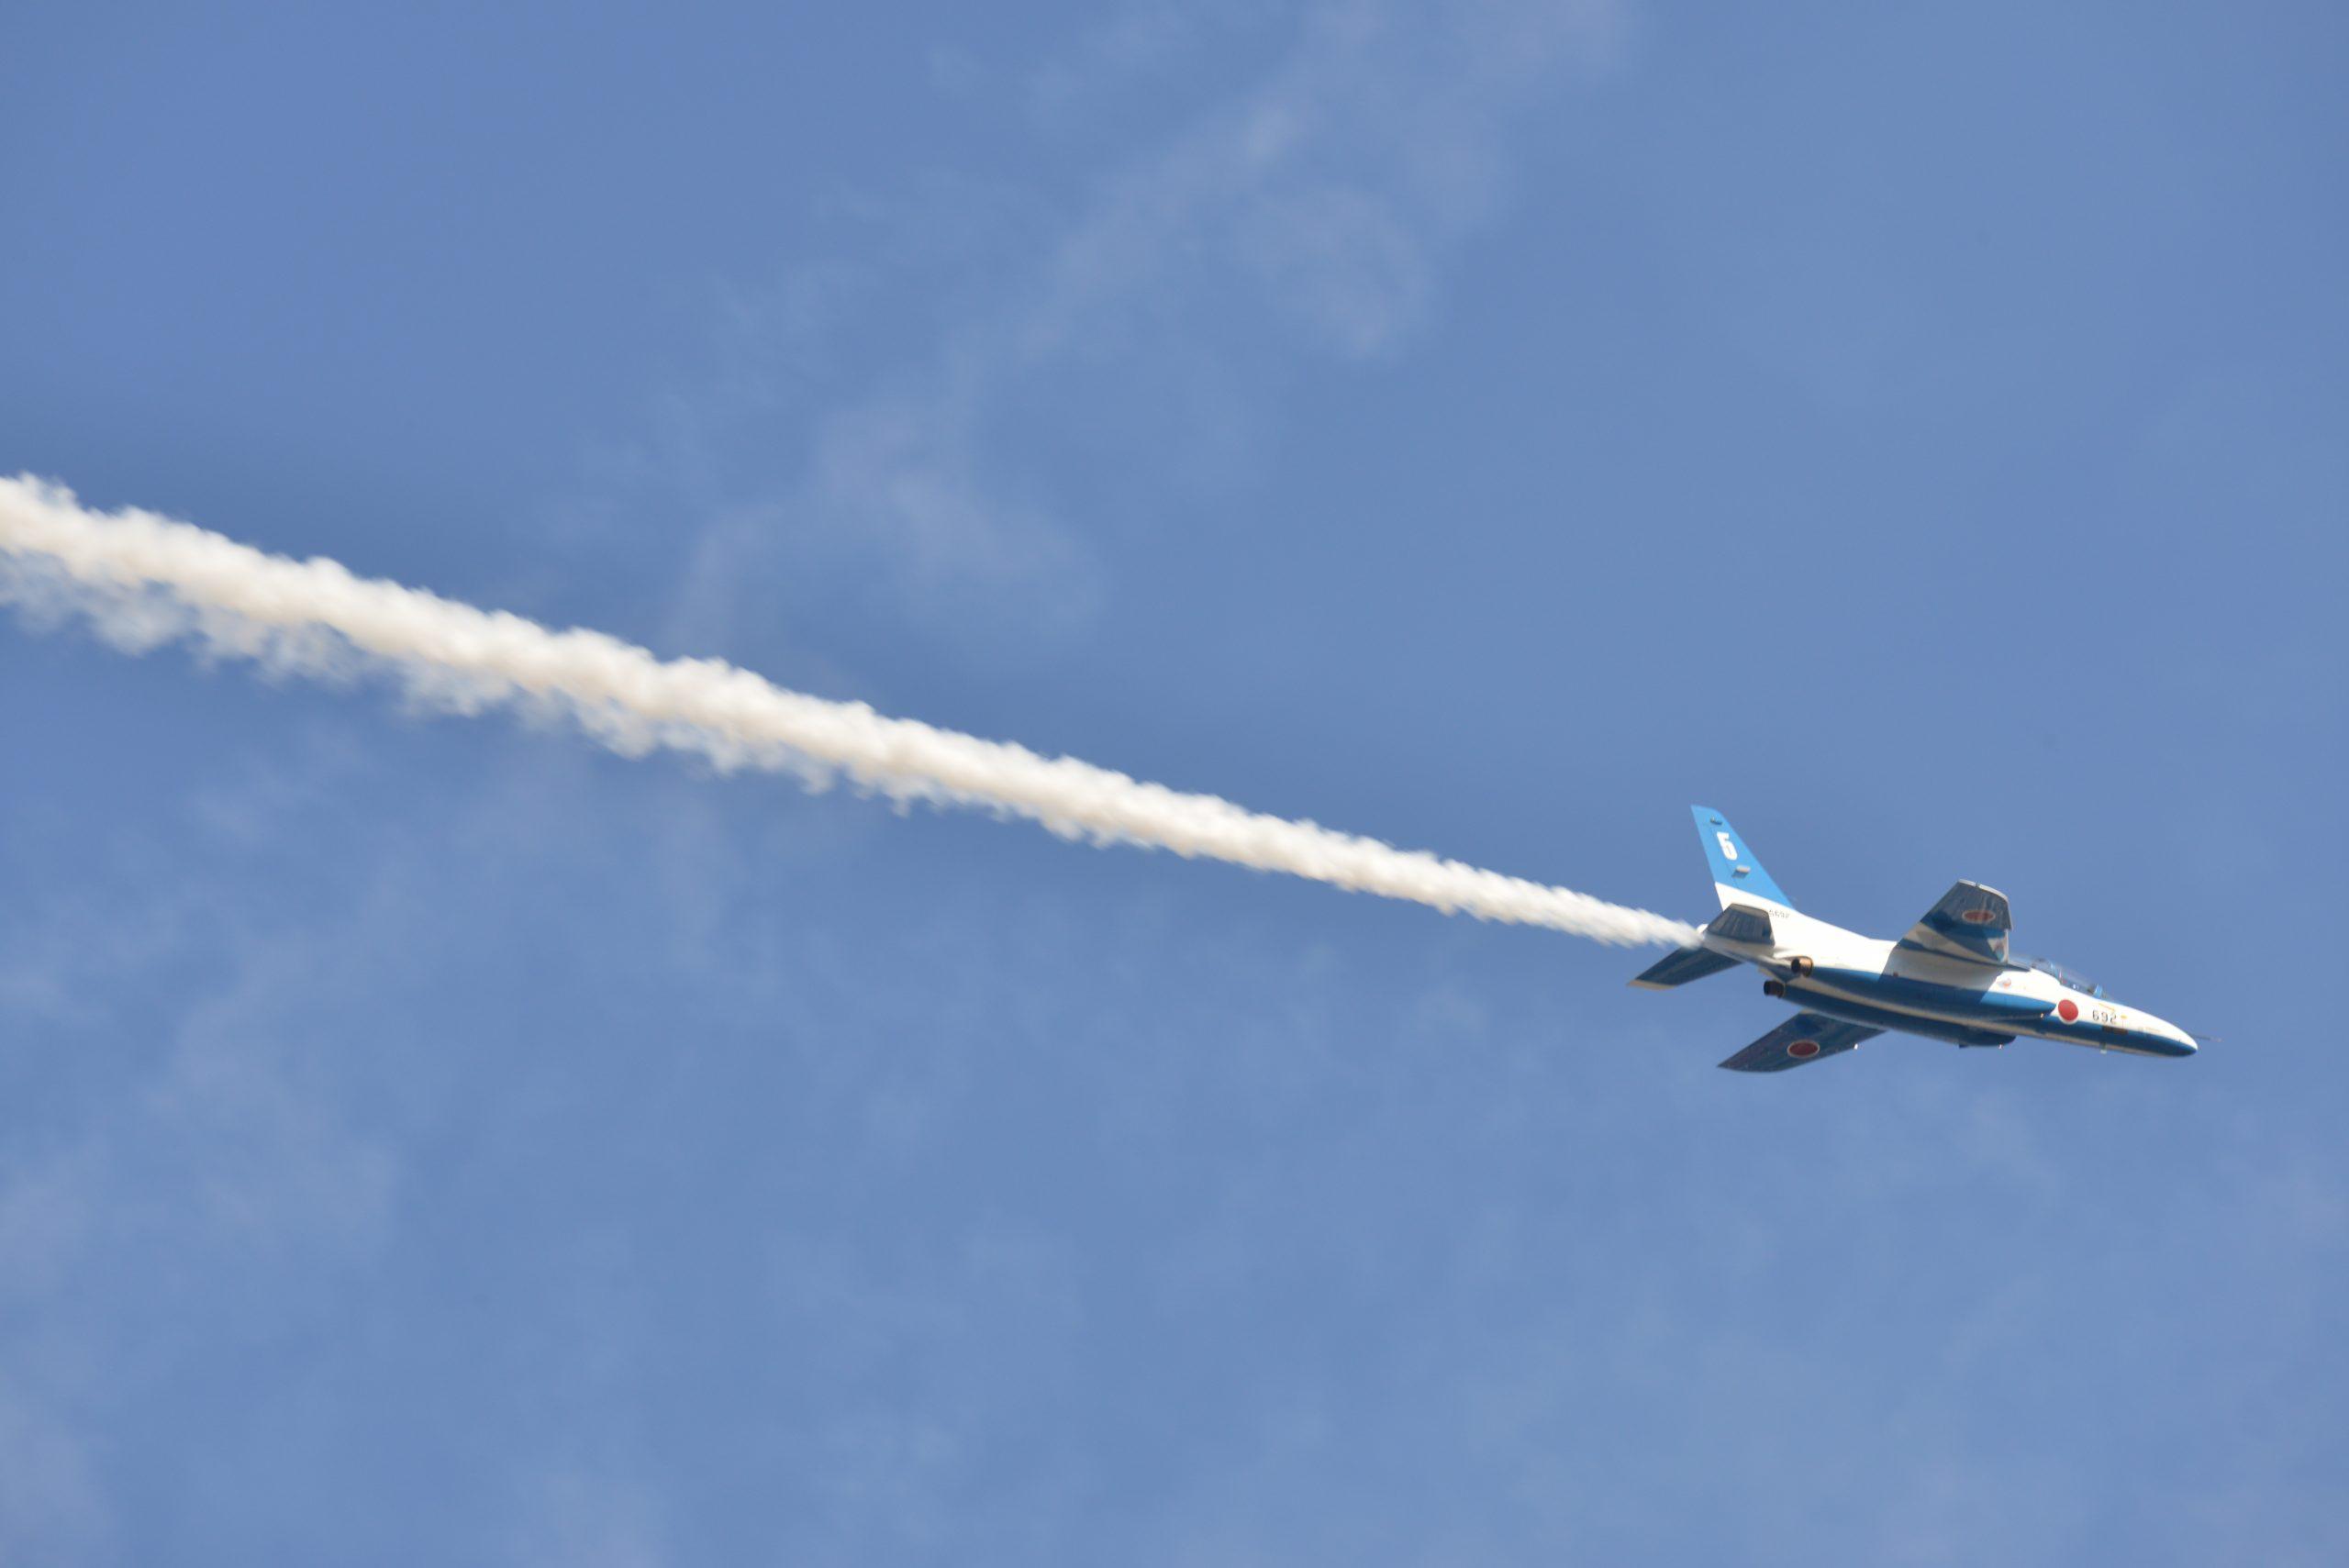 【Nikon】望遠レンズが導いた航空機撮影。